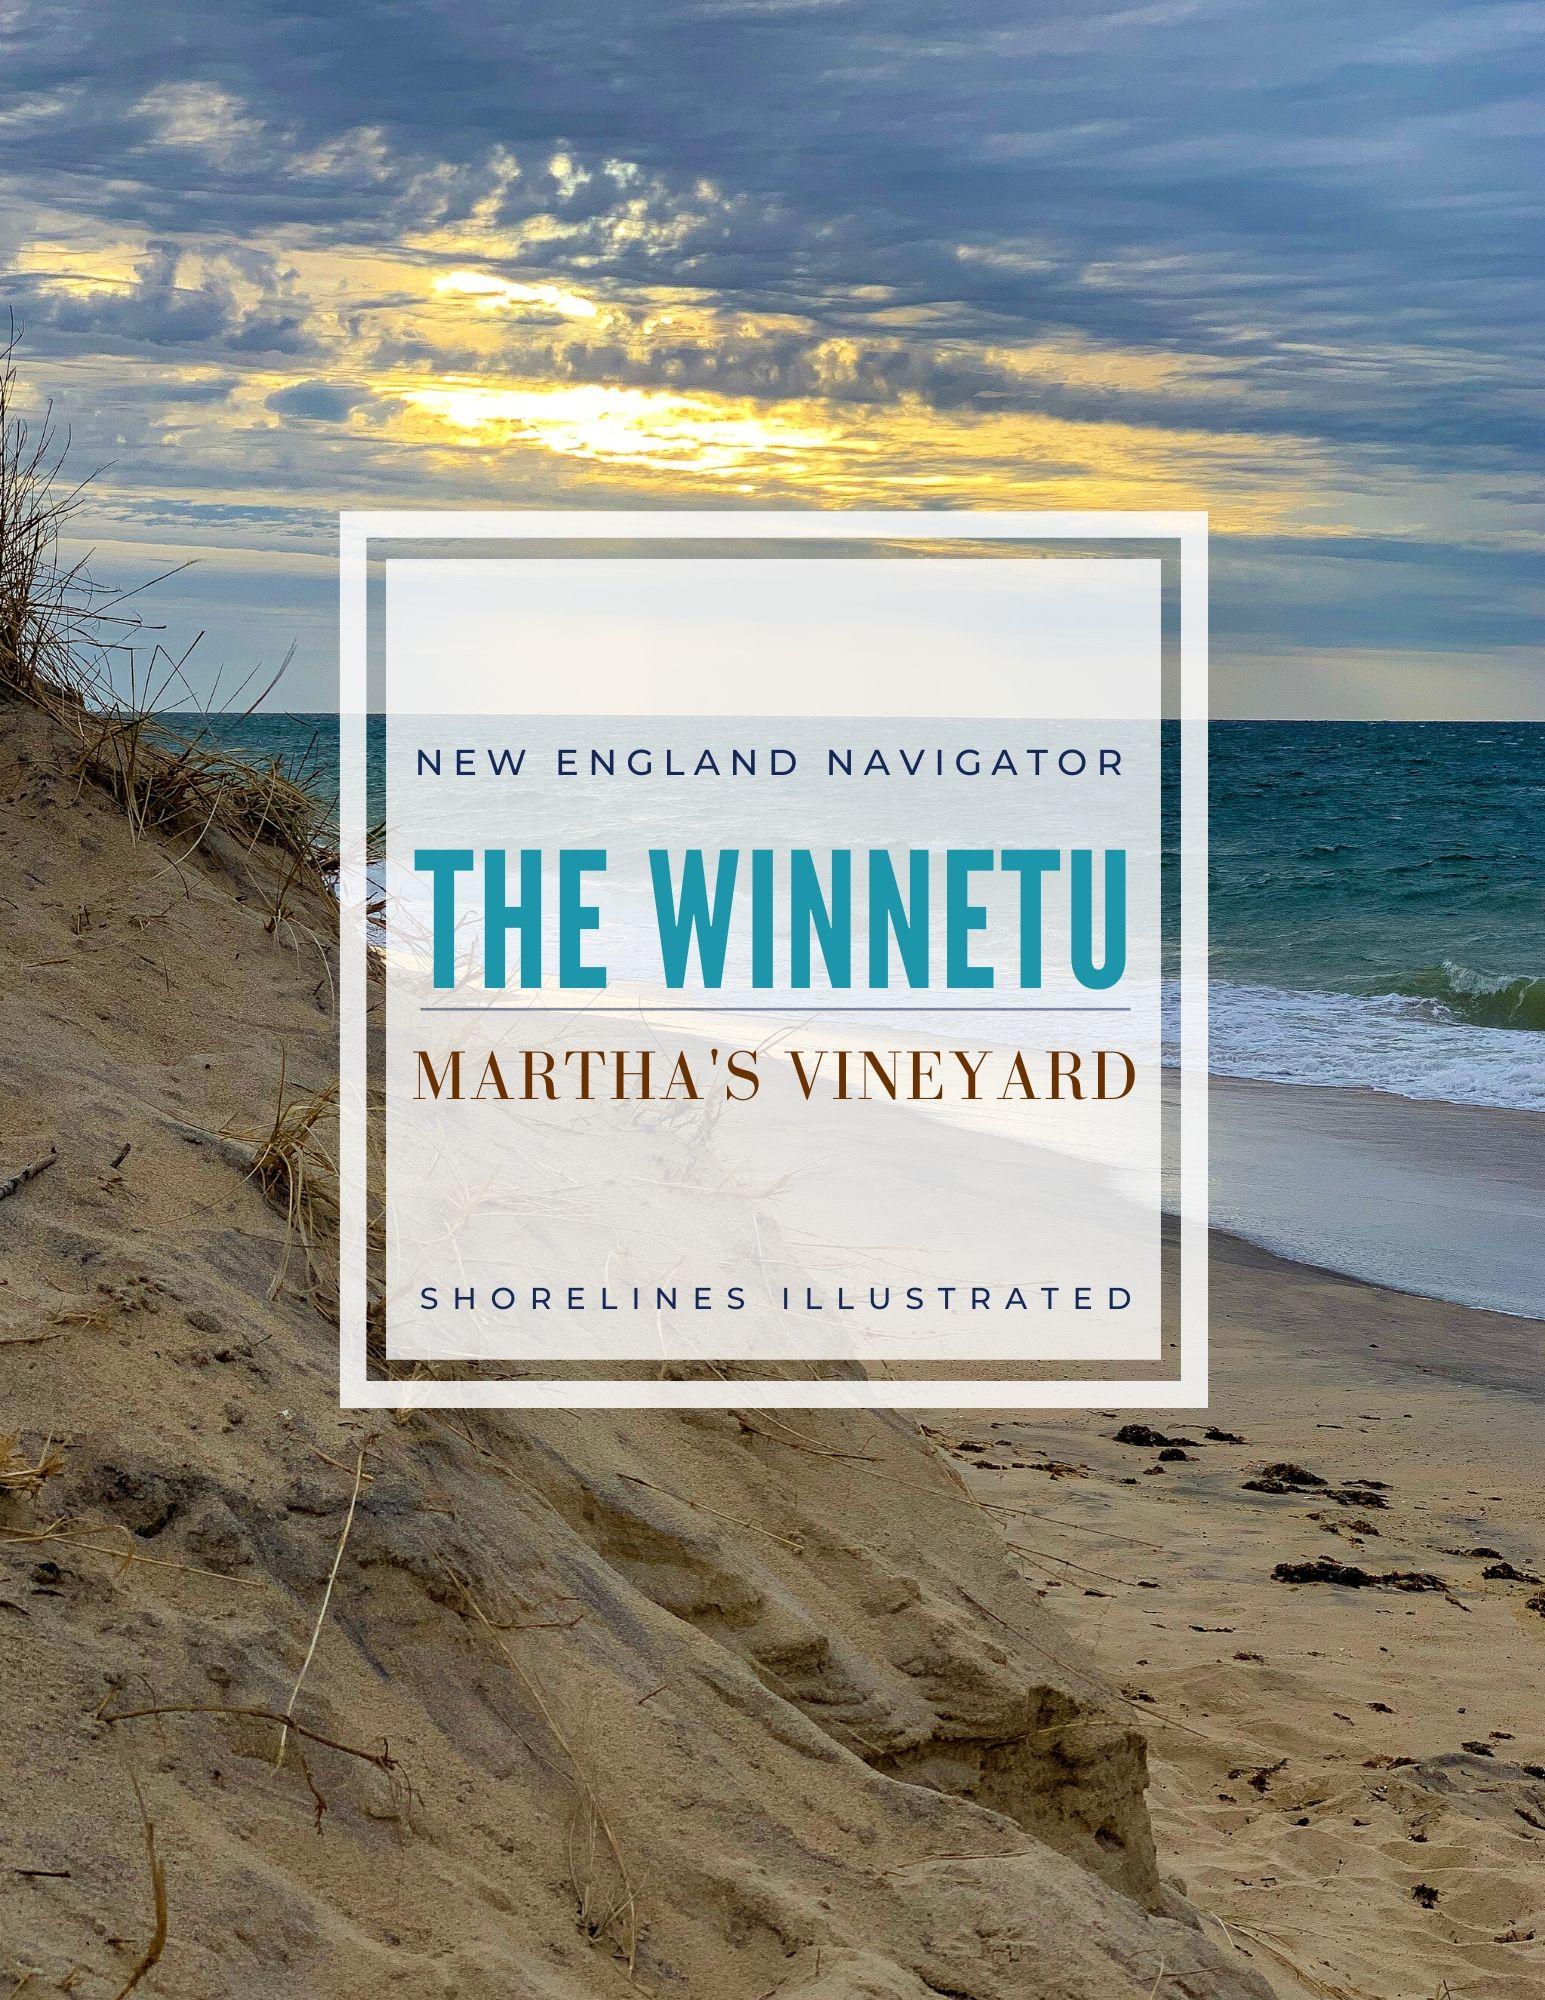 The Winnetu Oceanside Resort in Marthas Vineyard-1